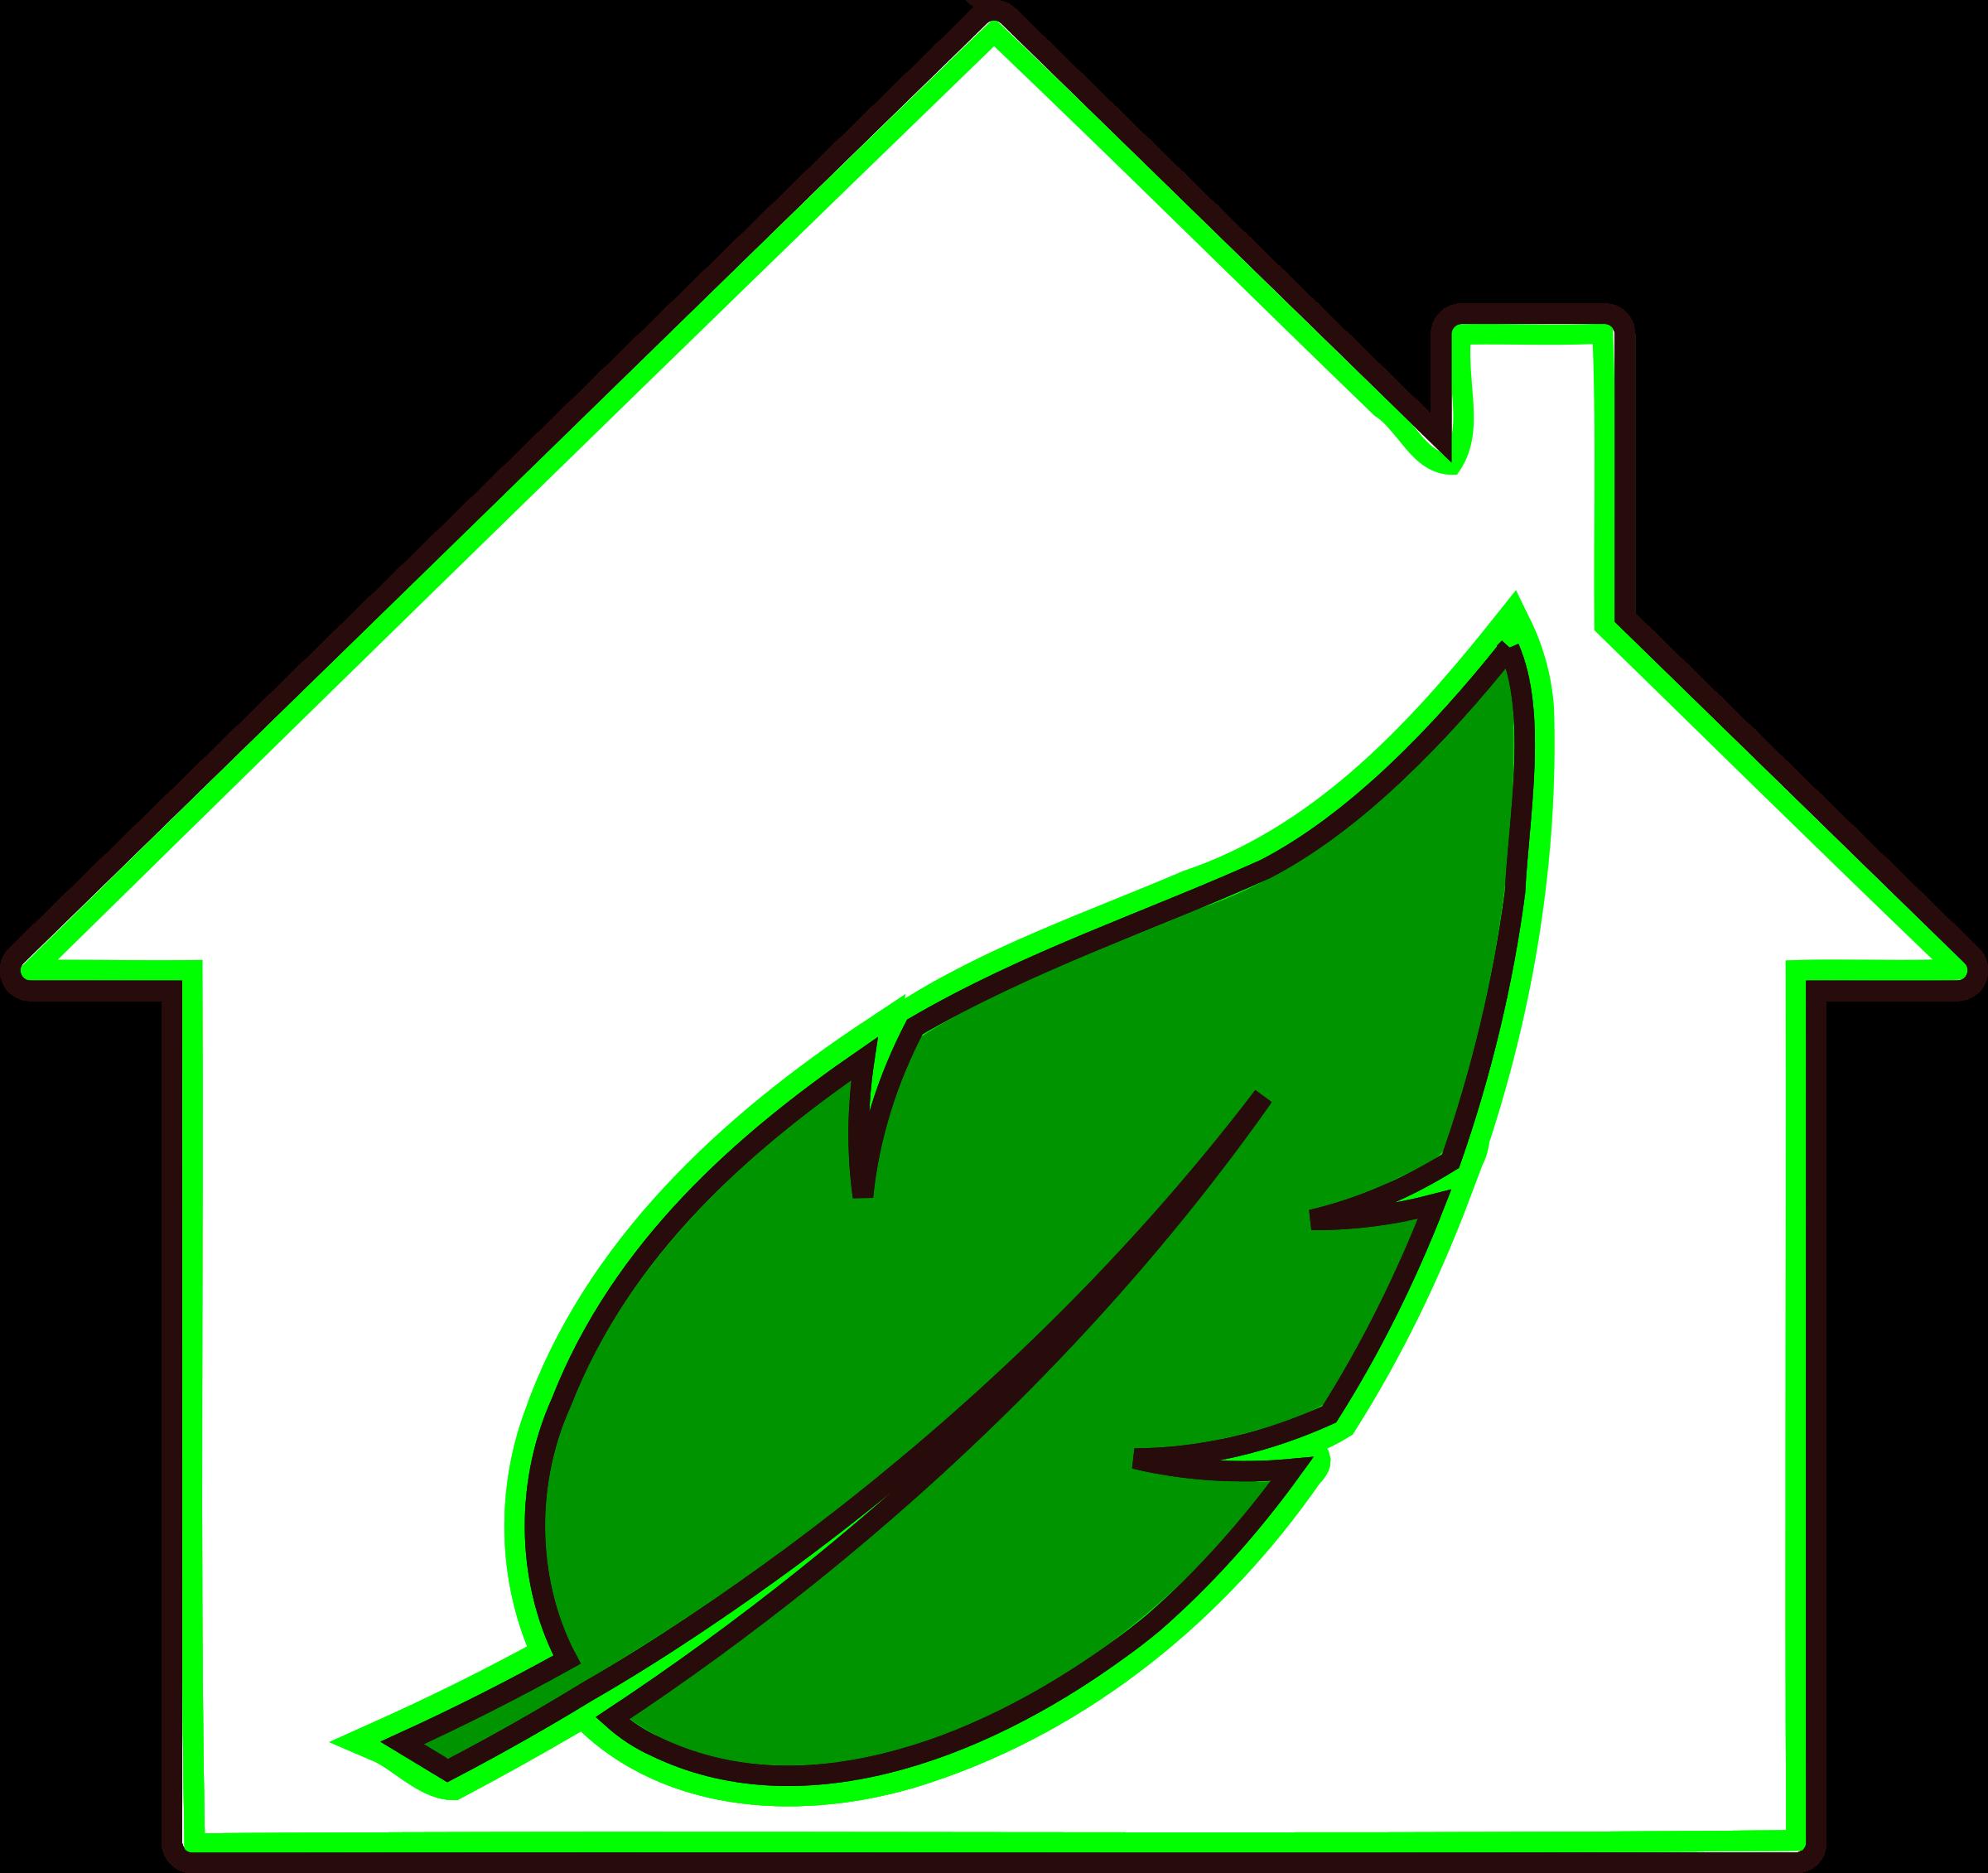 Clipart leaf house. Green home big image